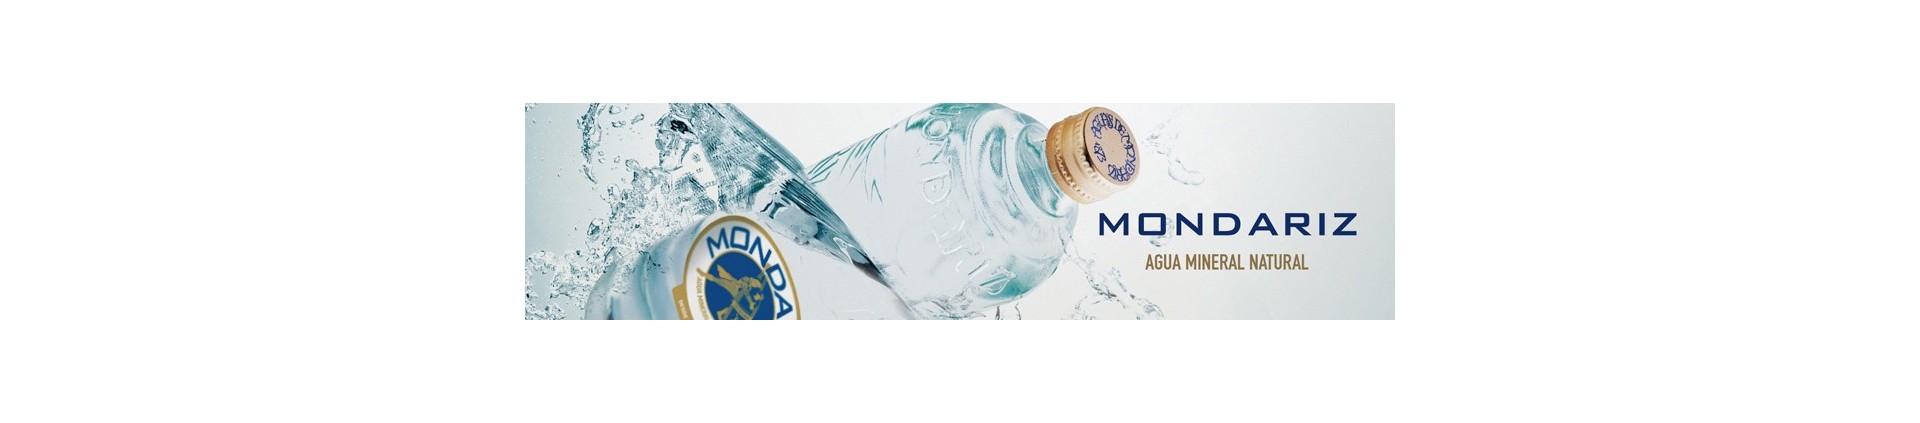 Comprar Agua Mineral Natural Mondariz - La Tienda Vichy Catalan